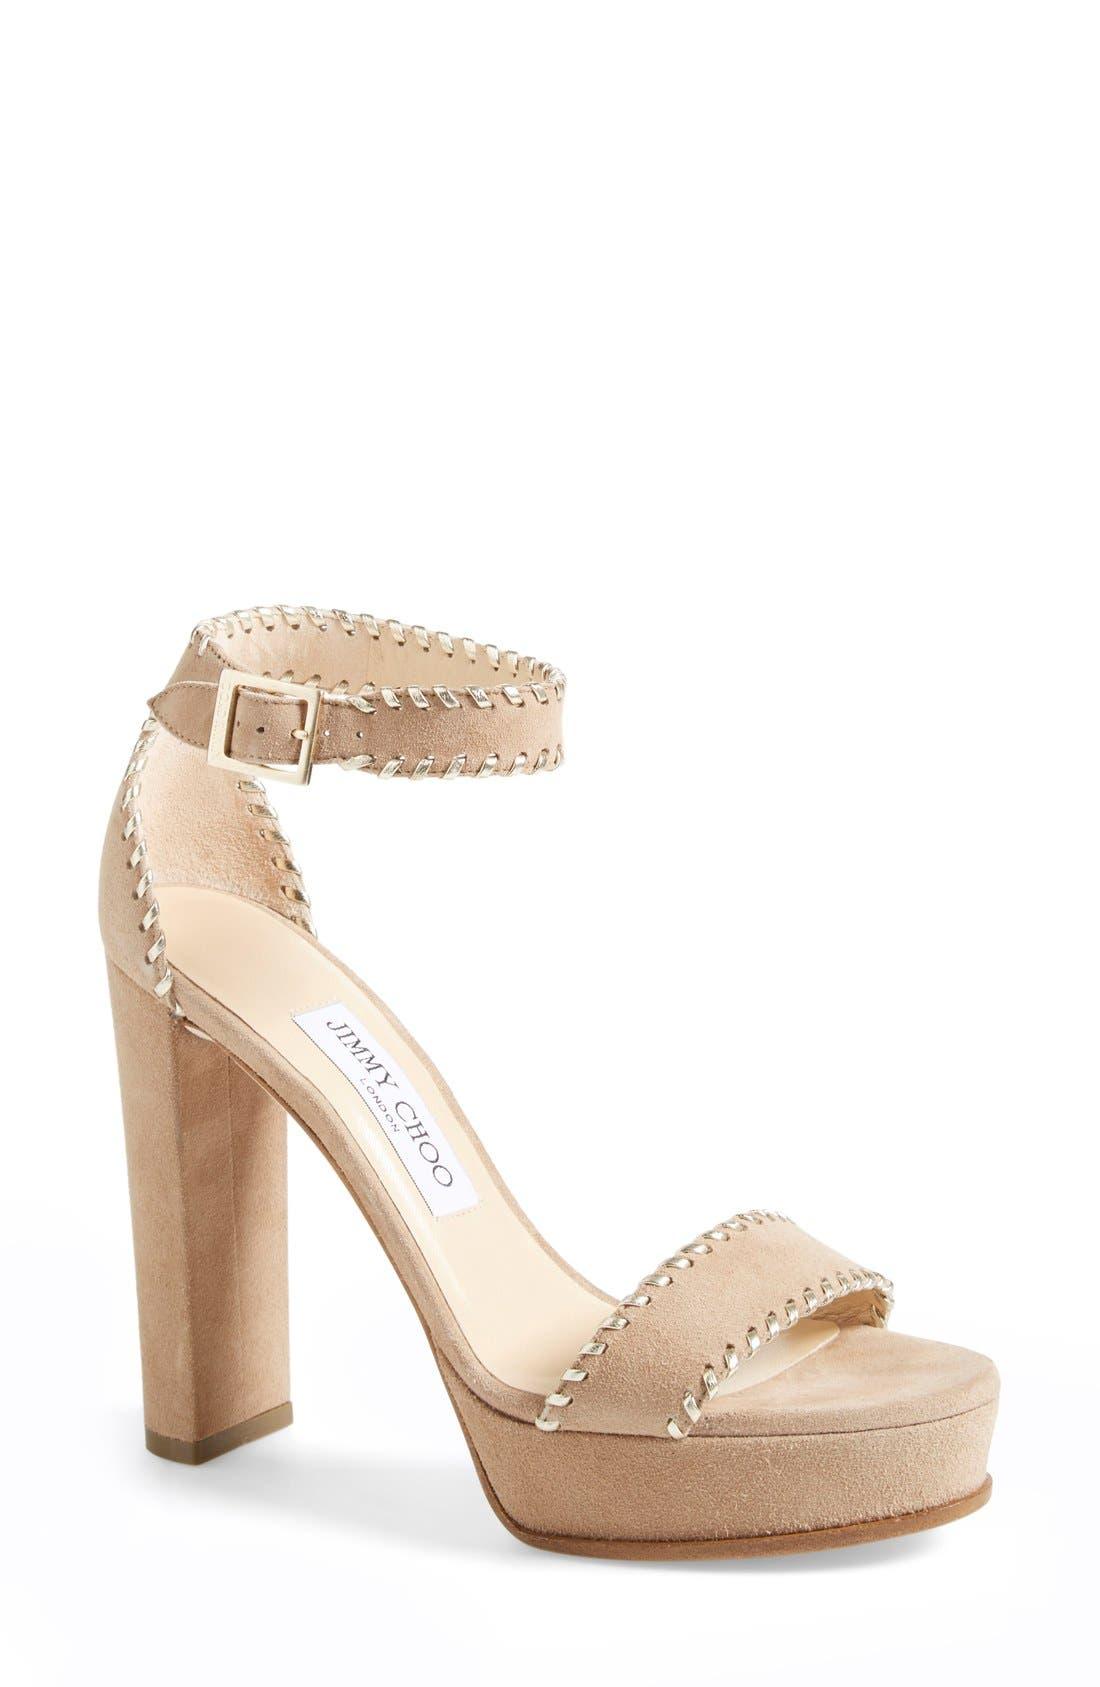 Main Image - Jimmy Choo 'Holly' Sandal (Women)